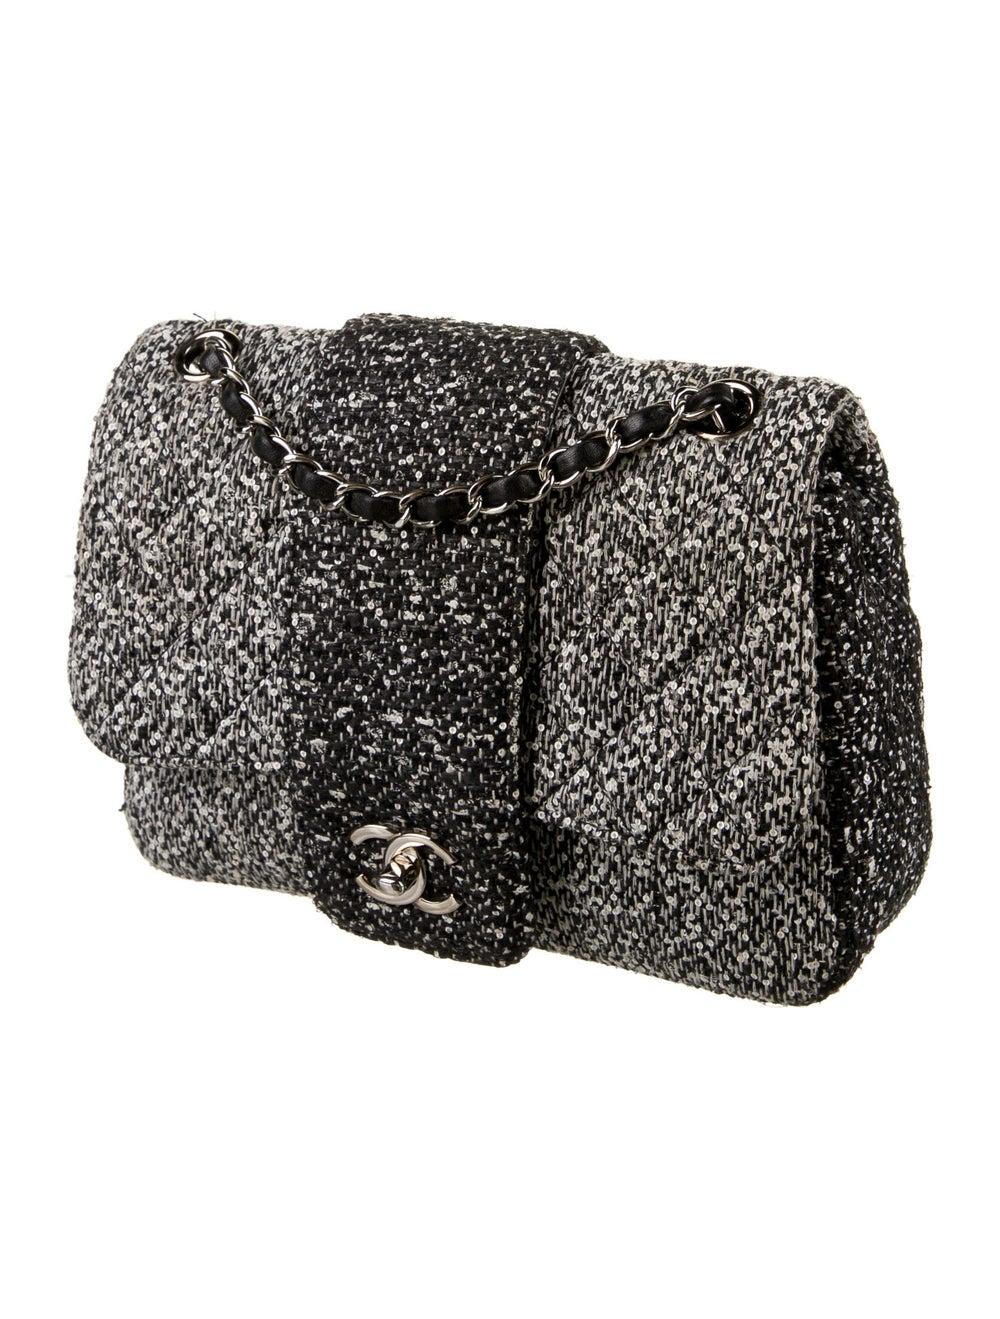 Chanel Tweed Elementary Chic Flap Bag Black - image 3